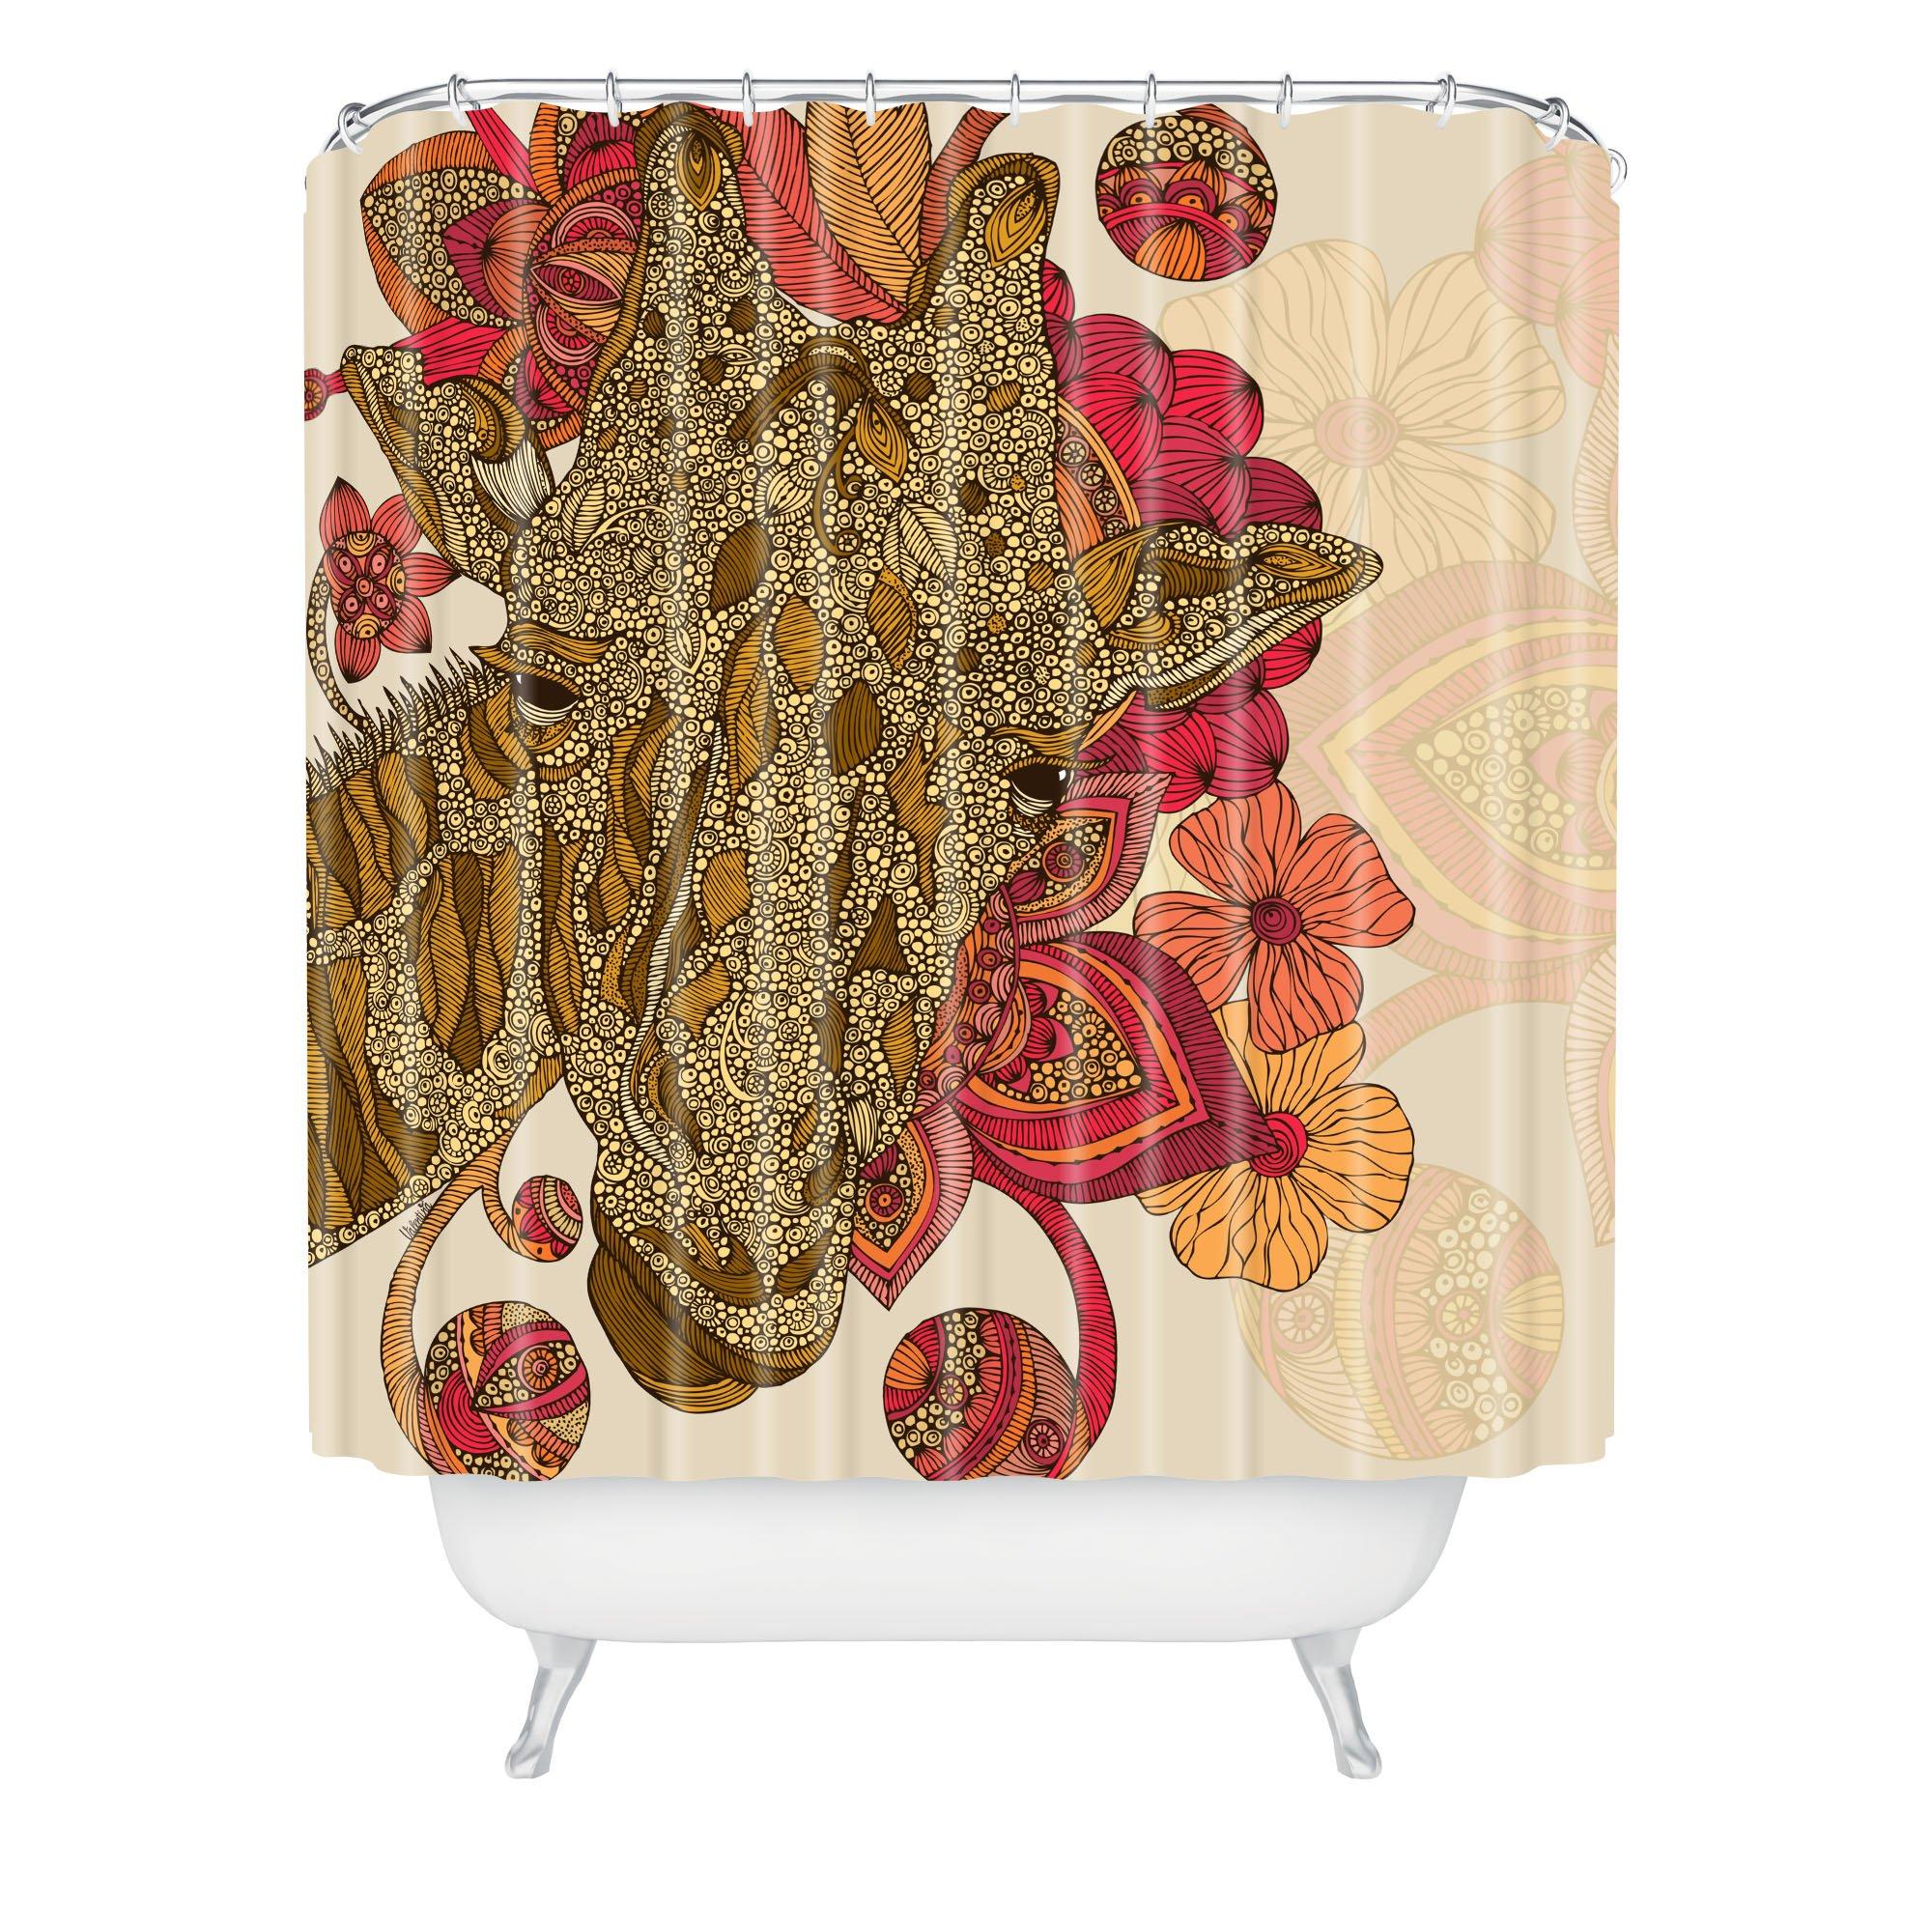 Deny Designs Valentina Ramos The Giraffe Shower Curtain, 69 by 72-Inch